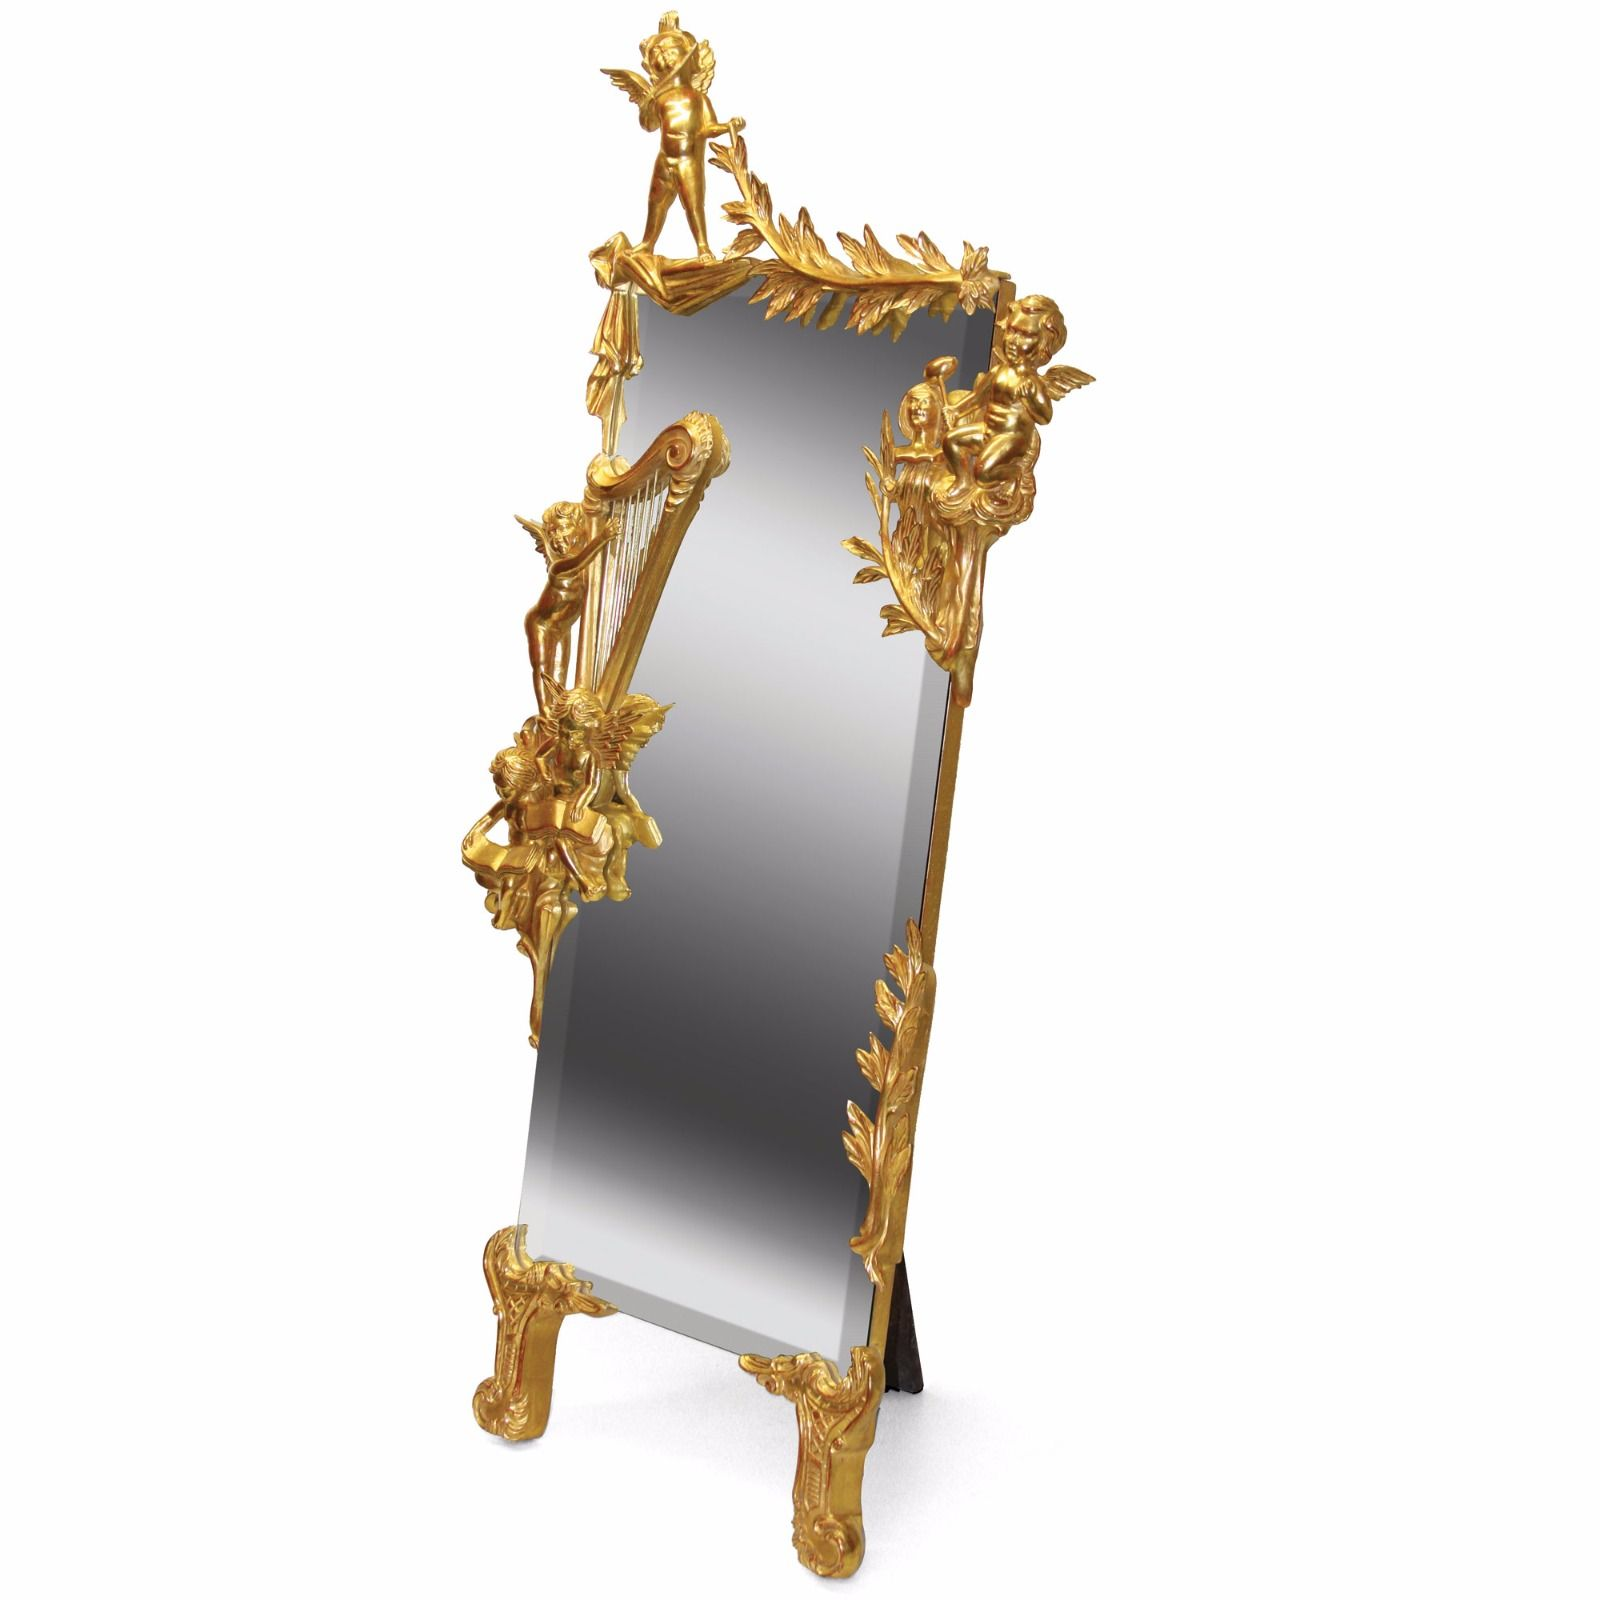 Water gilded cherub cheval mirror - 60in.